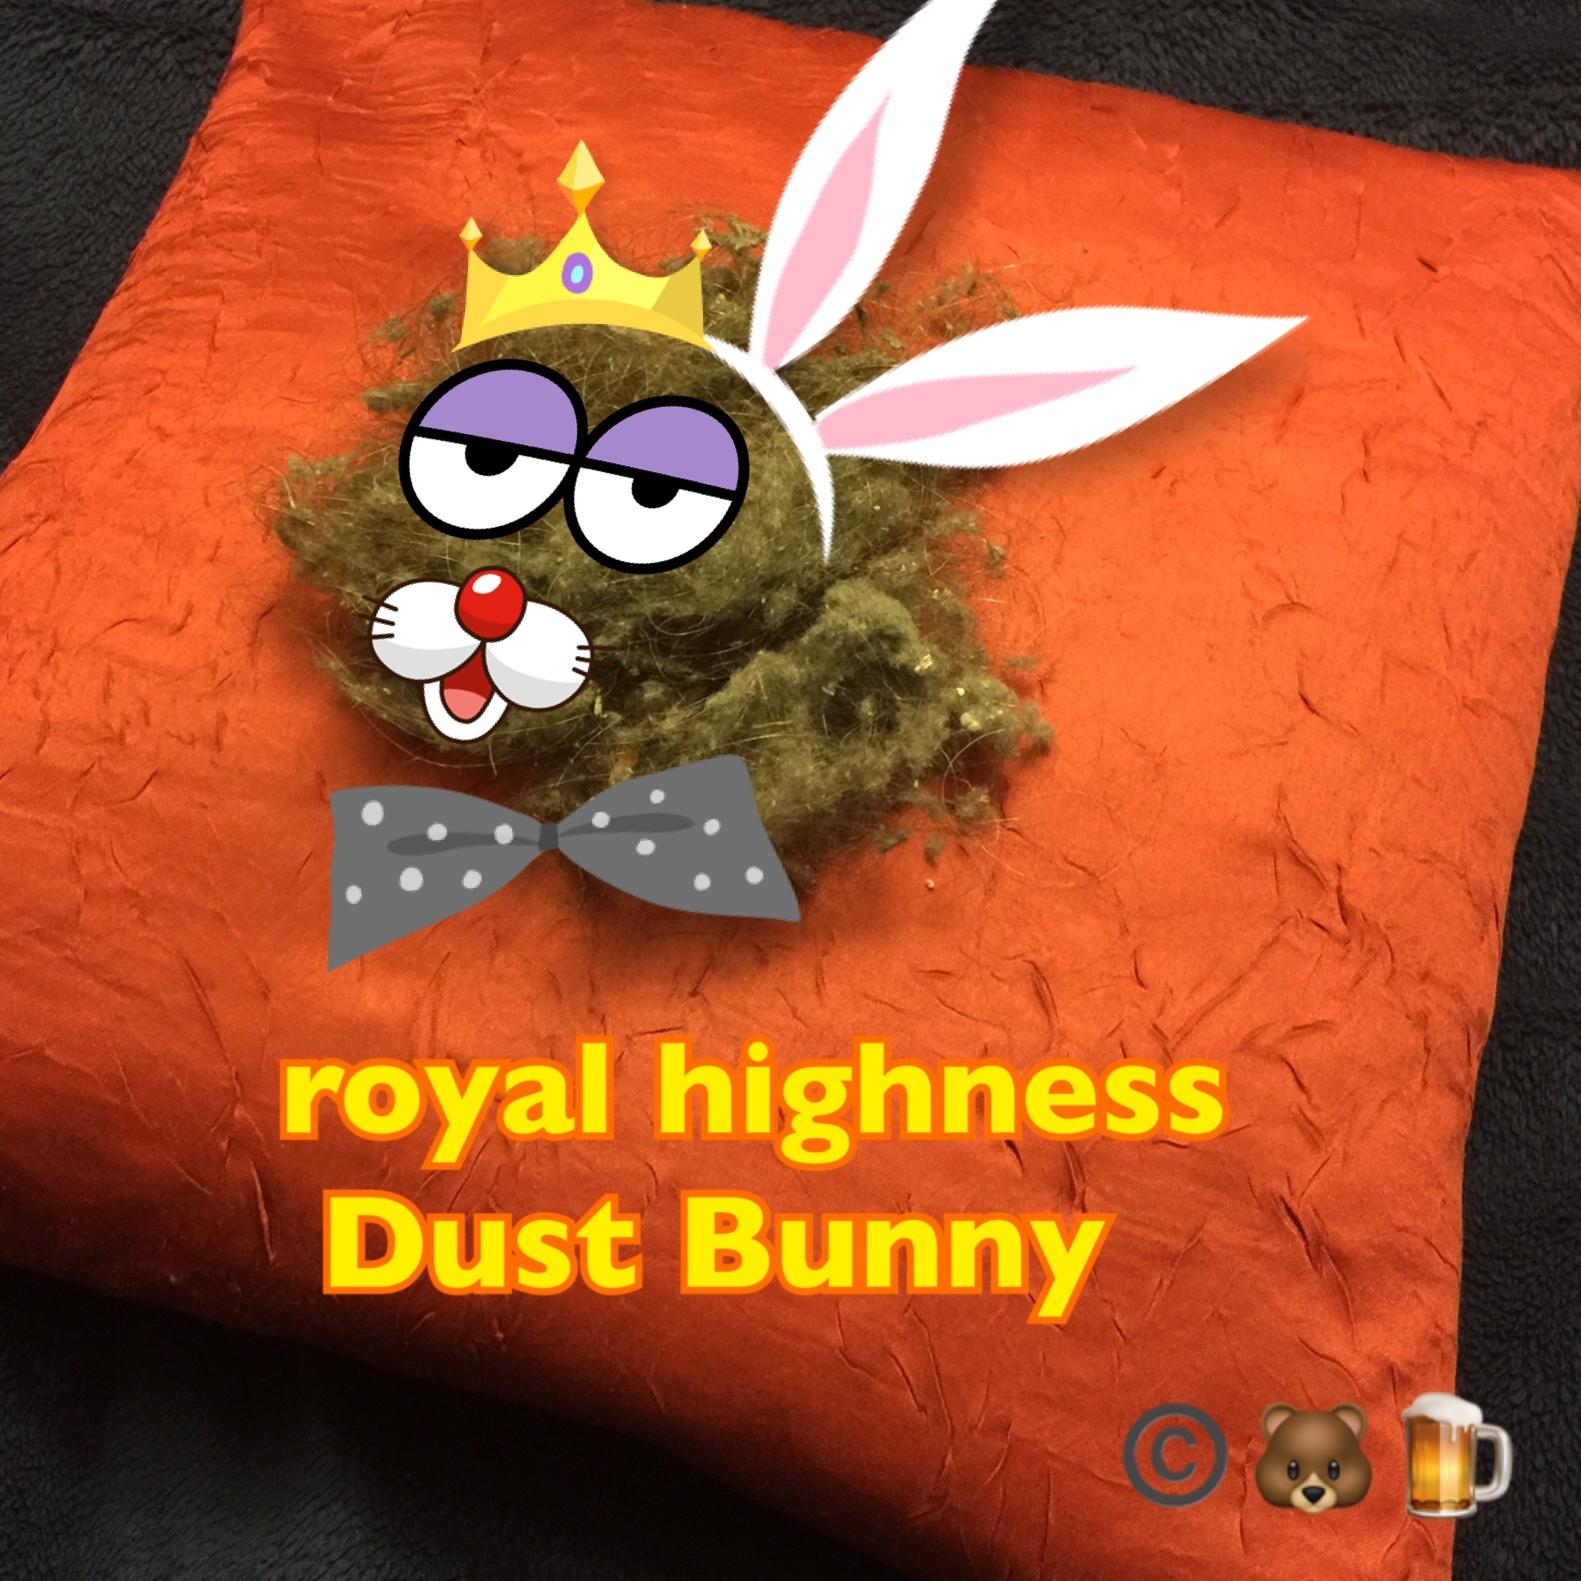 royal highness dust bunny